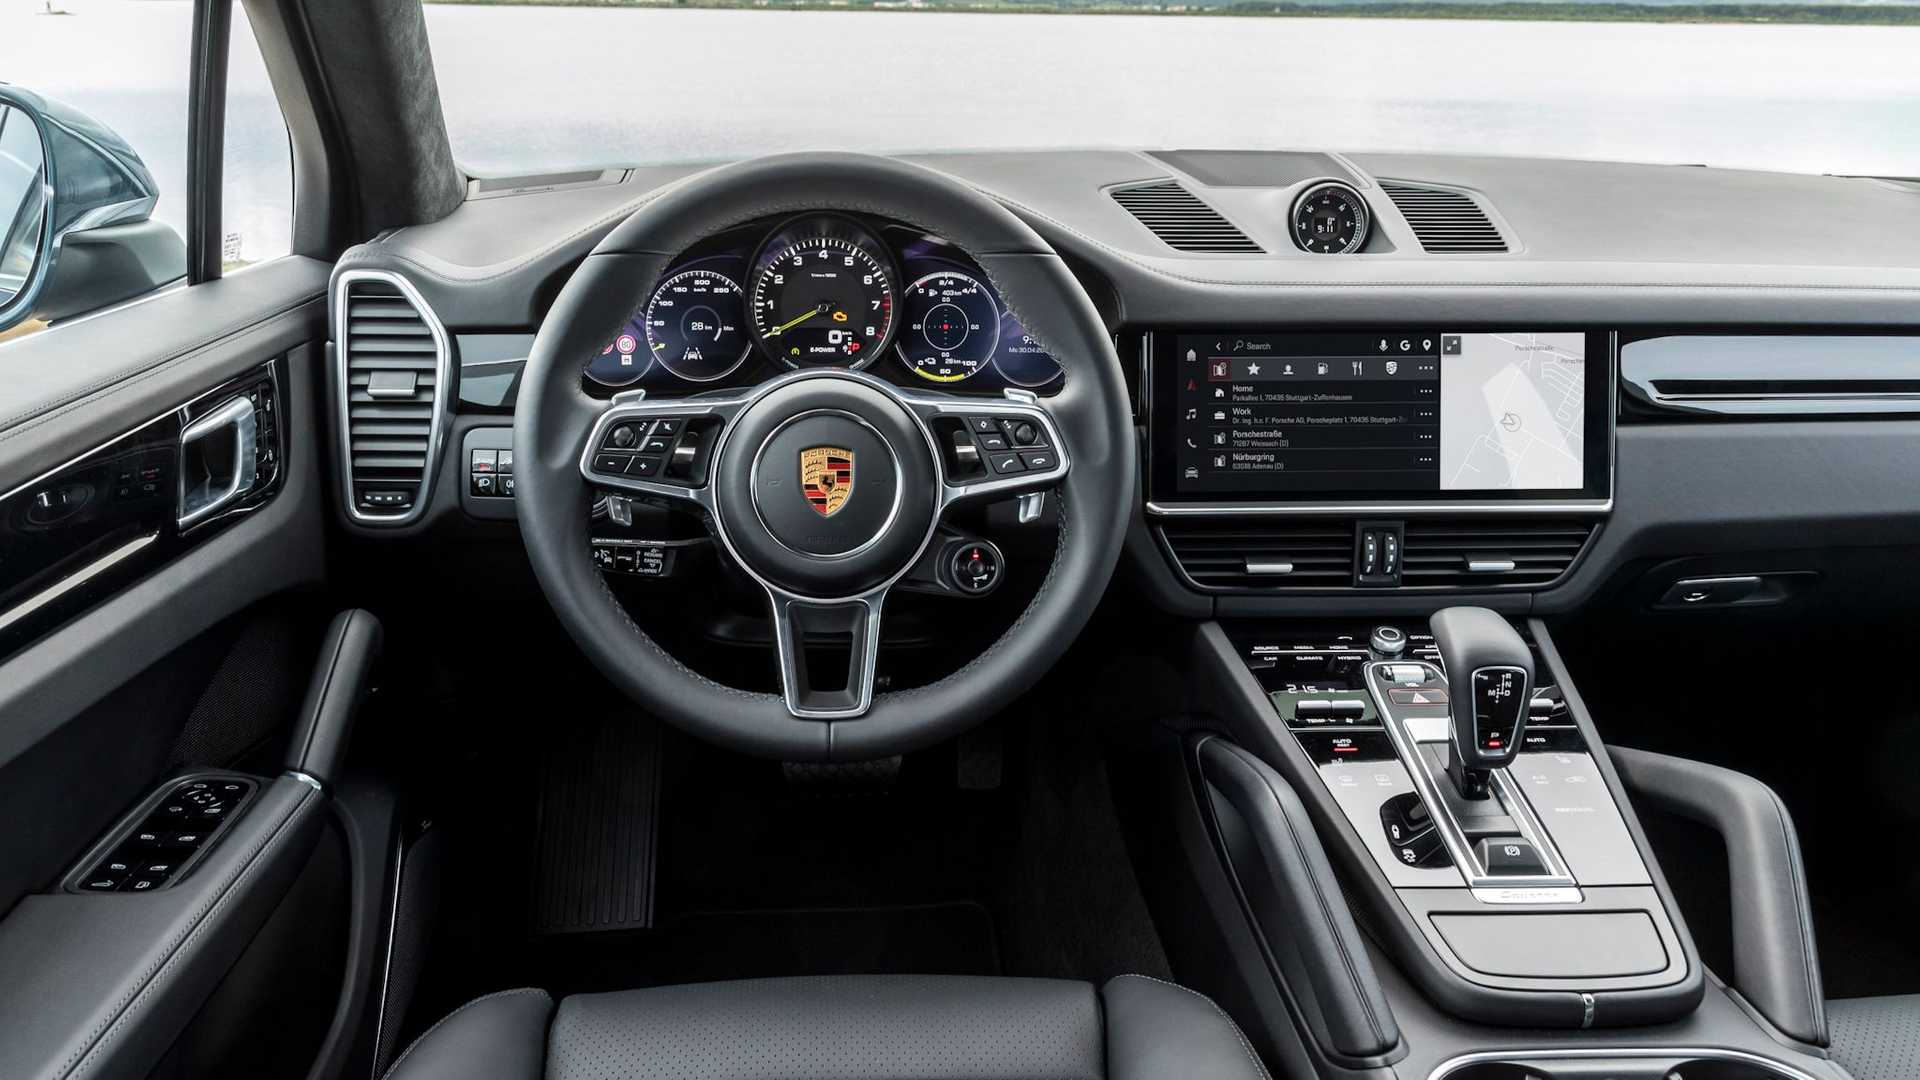 Porsche-Communication-Management-6-12